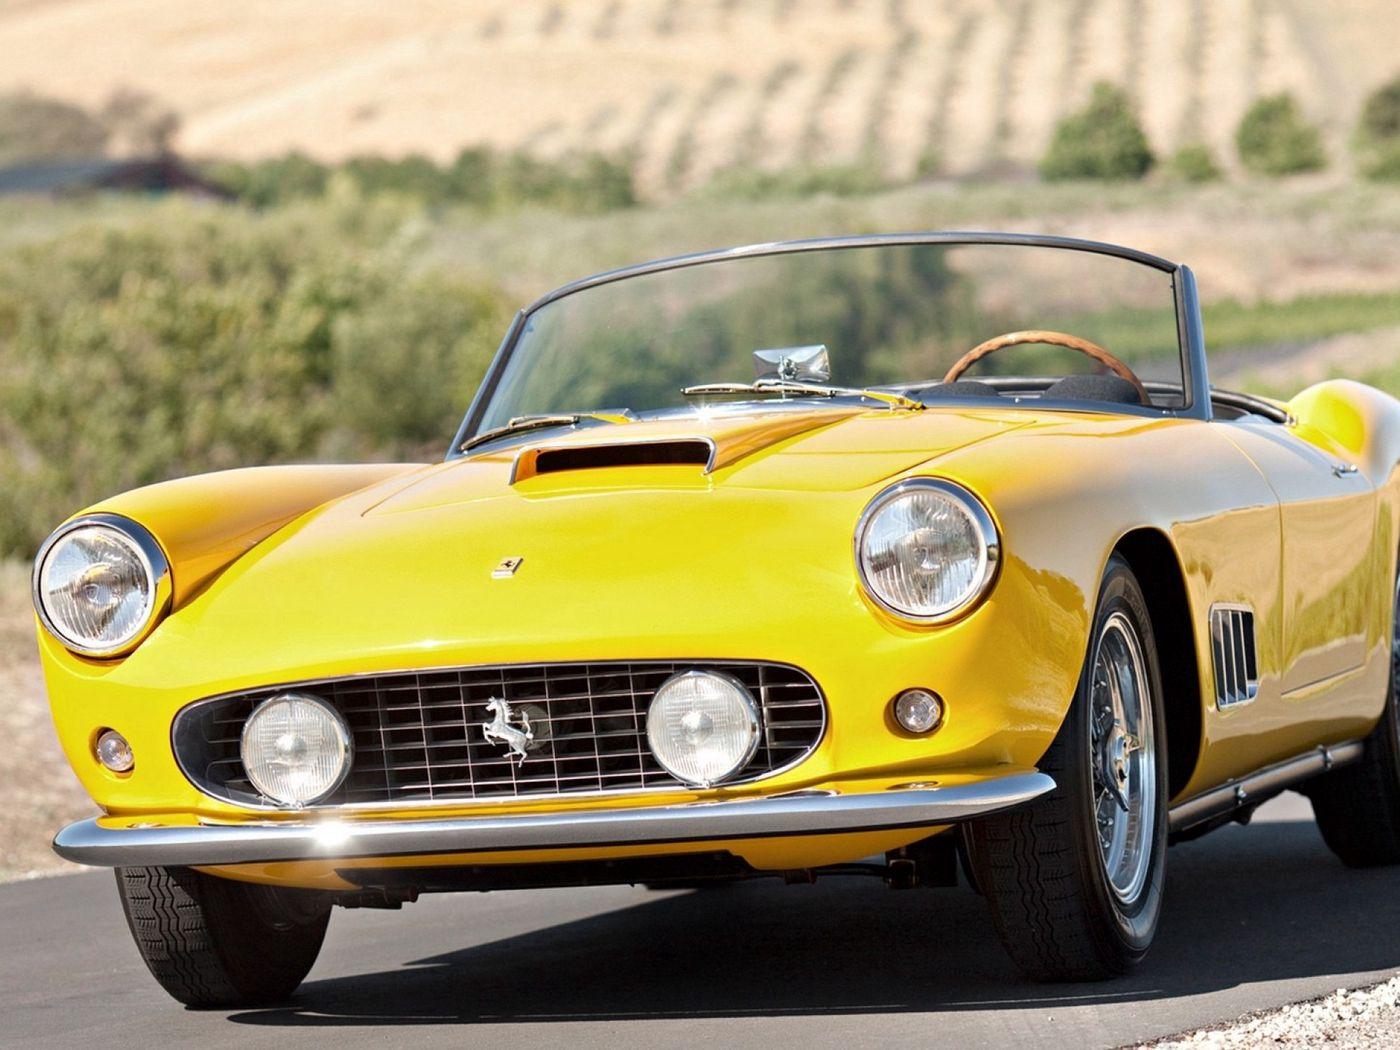 1400x1050 Wallpaper vintage, ferrari, convertible, yellow